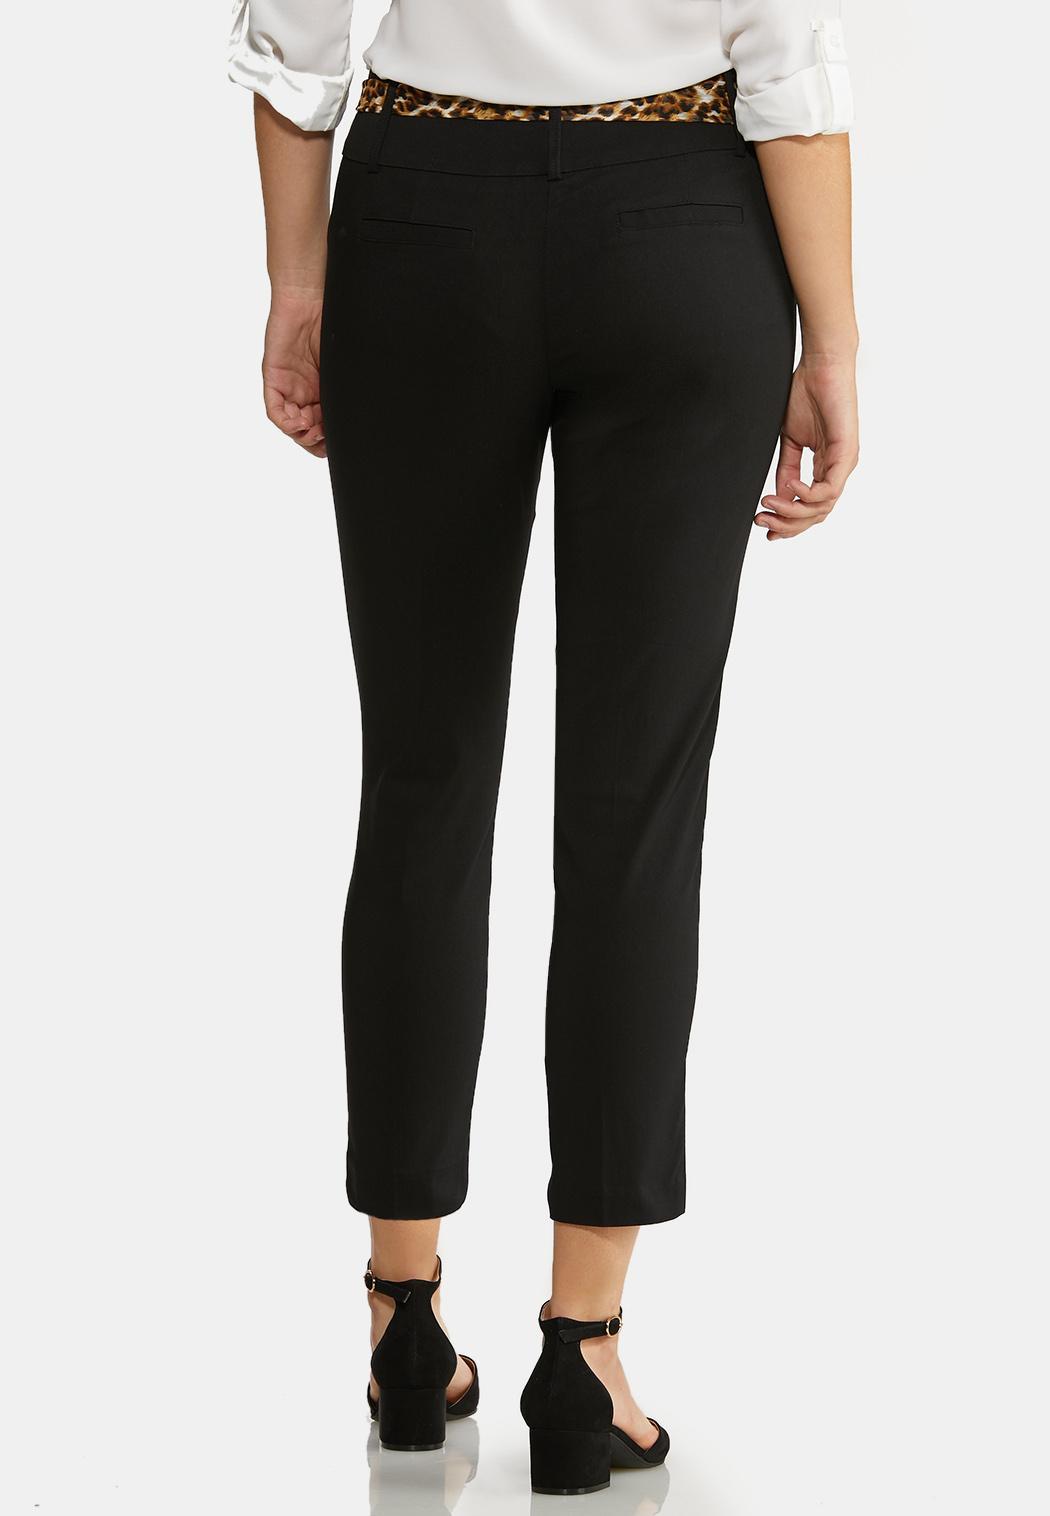 Leopard Belt Black Ankle Pants (Item #43940532)